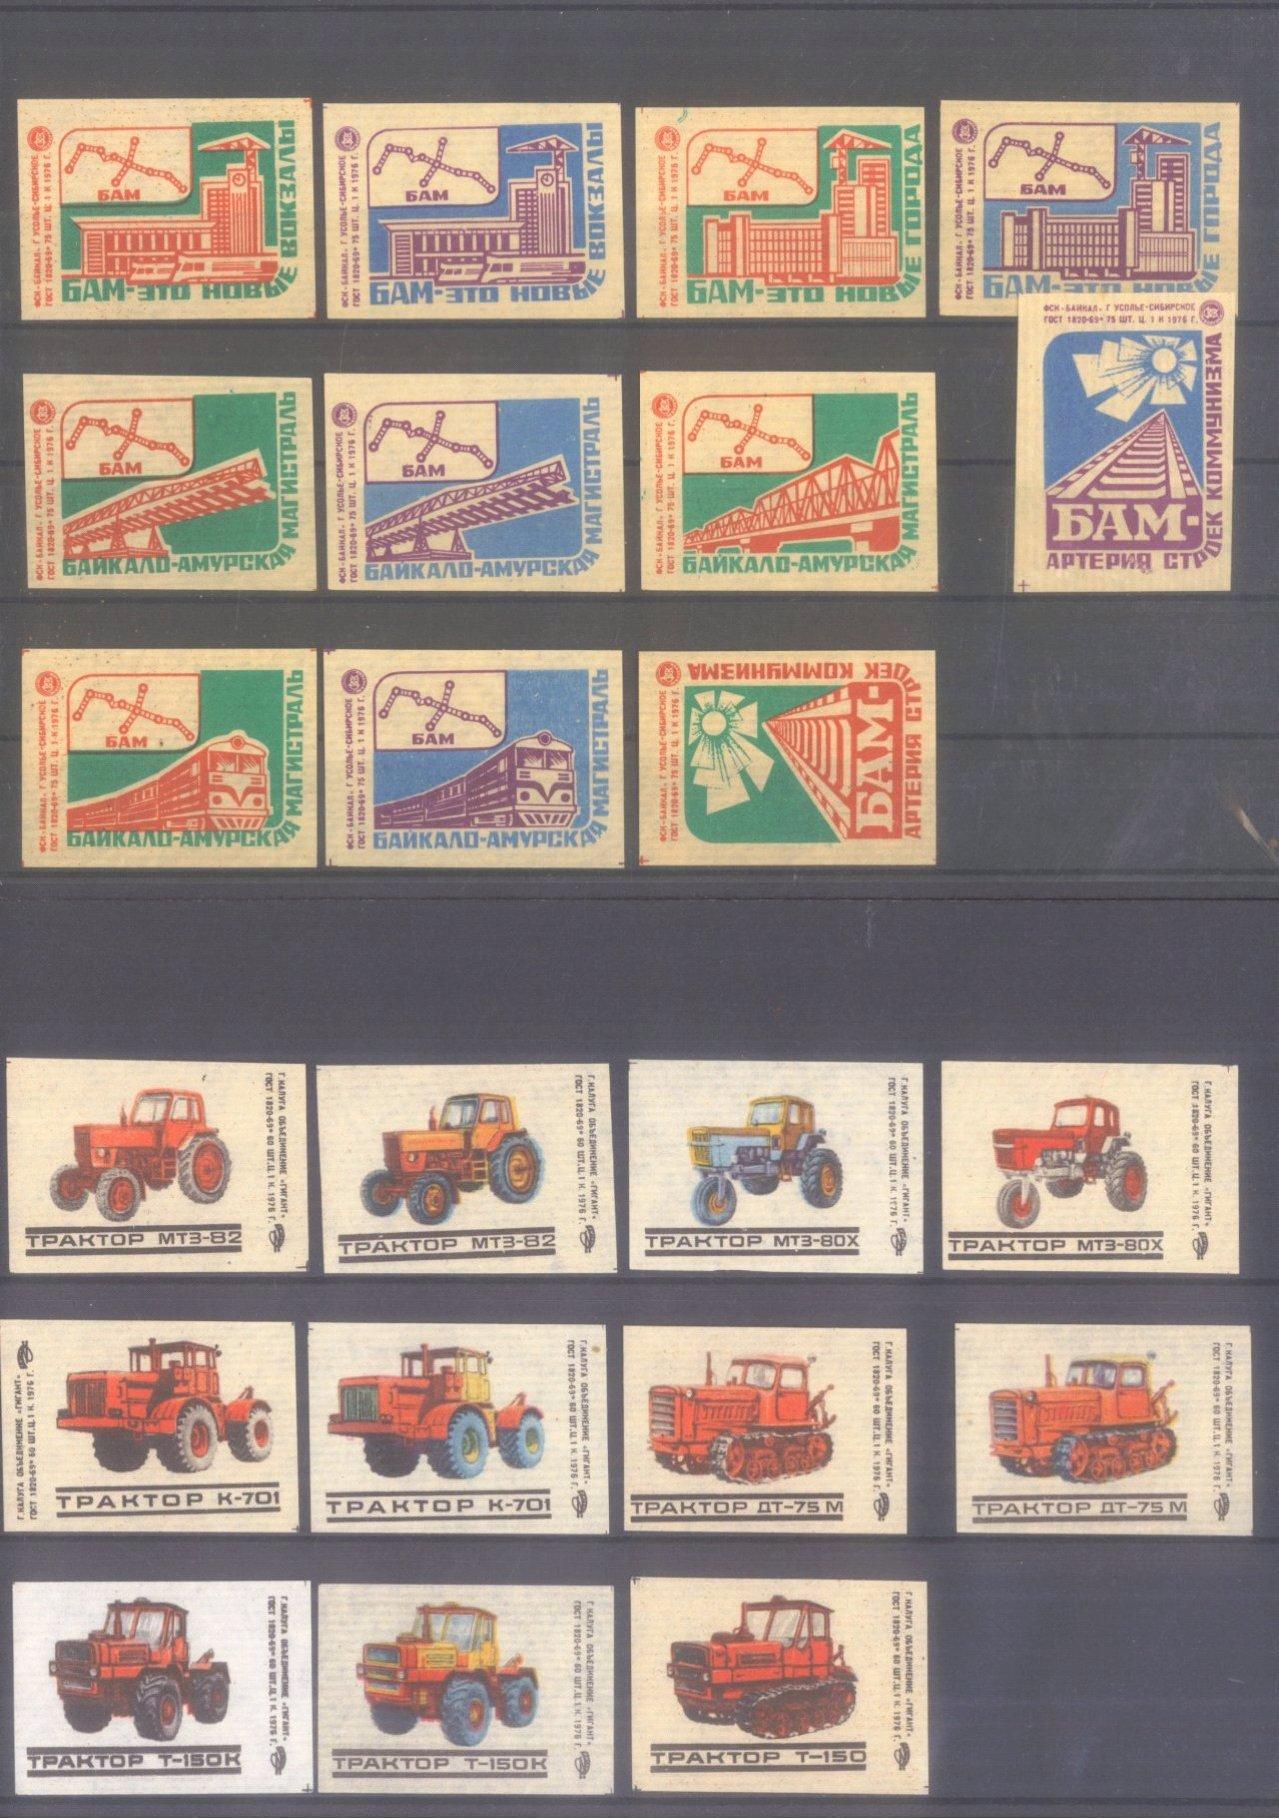 SOWJETUNION Vignetten: BAM, Traktoren, Eisenbahn